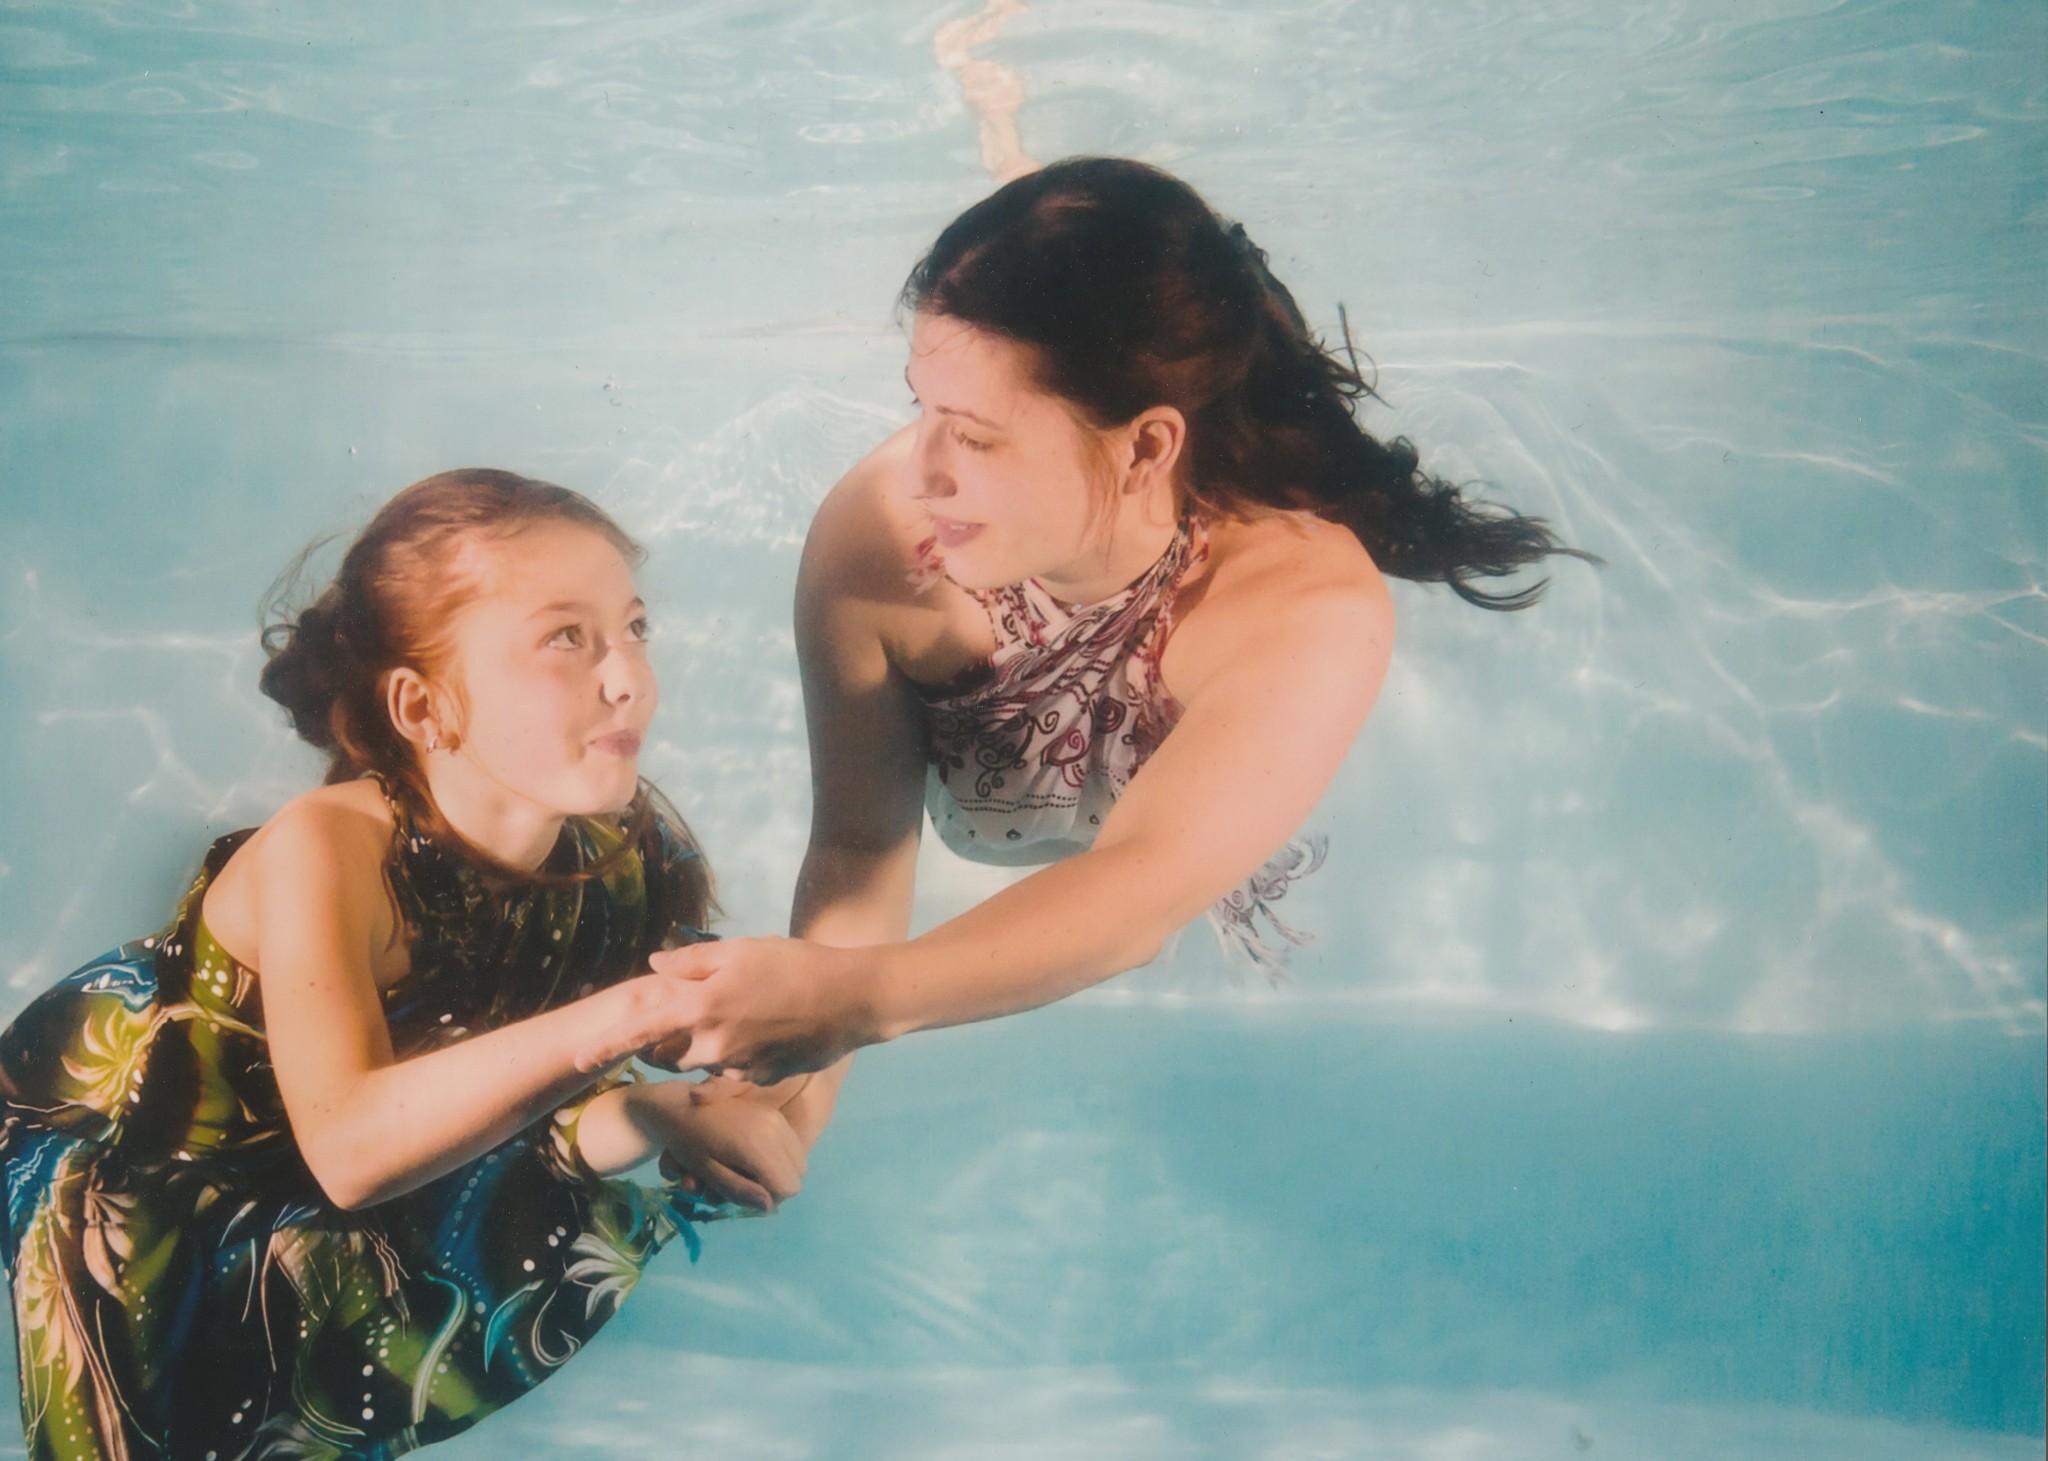 Baby club plaváček HB - Míša s plave s Emičkou - YouTube